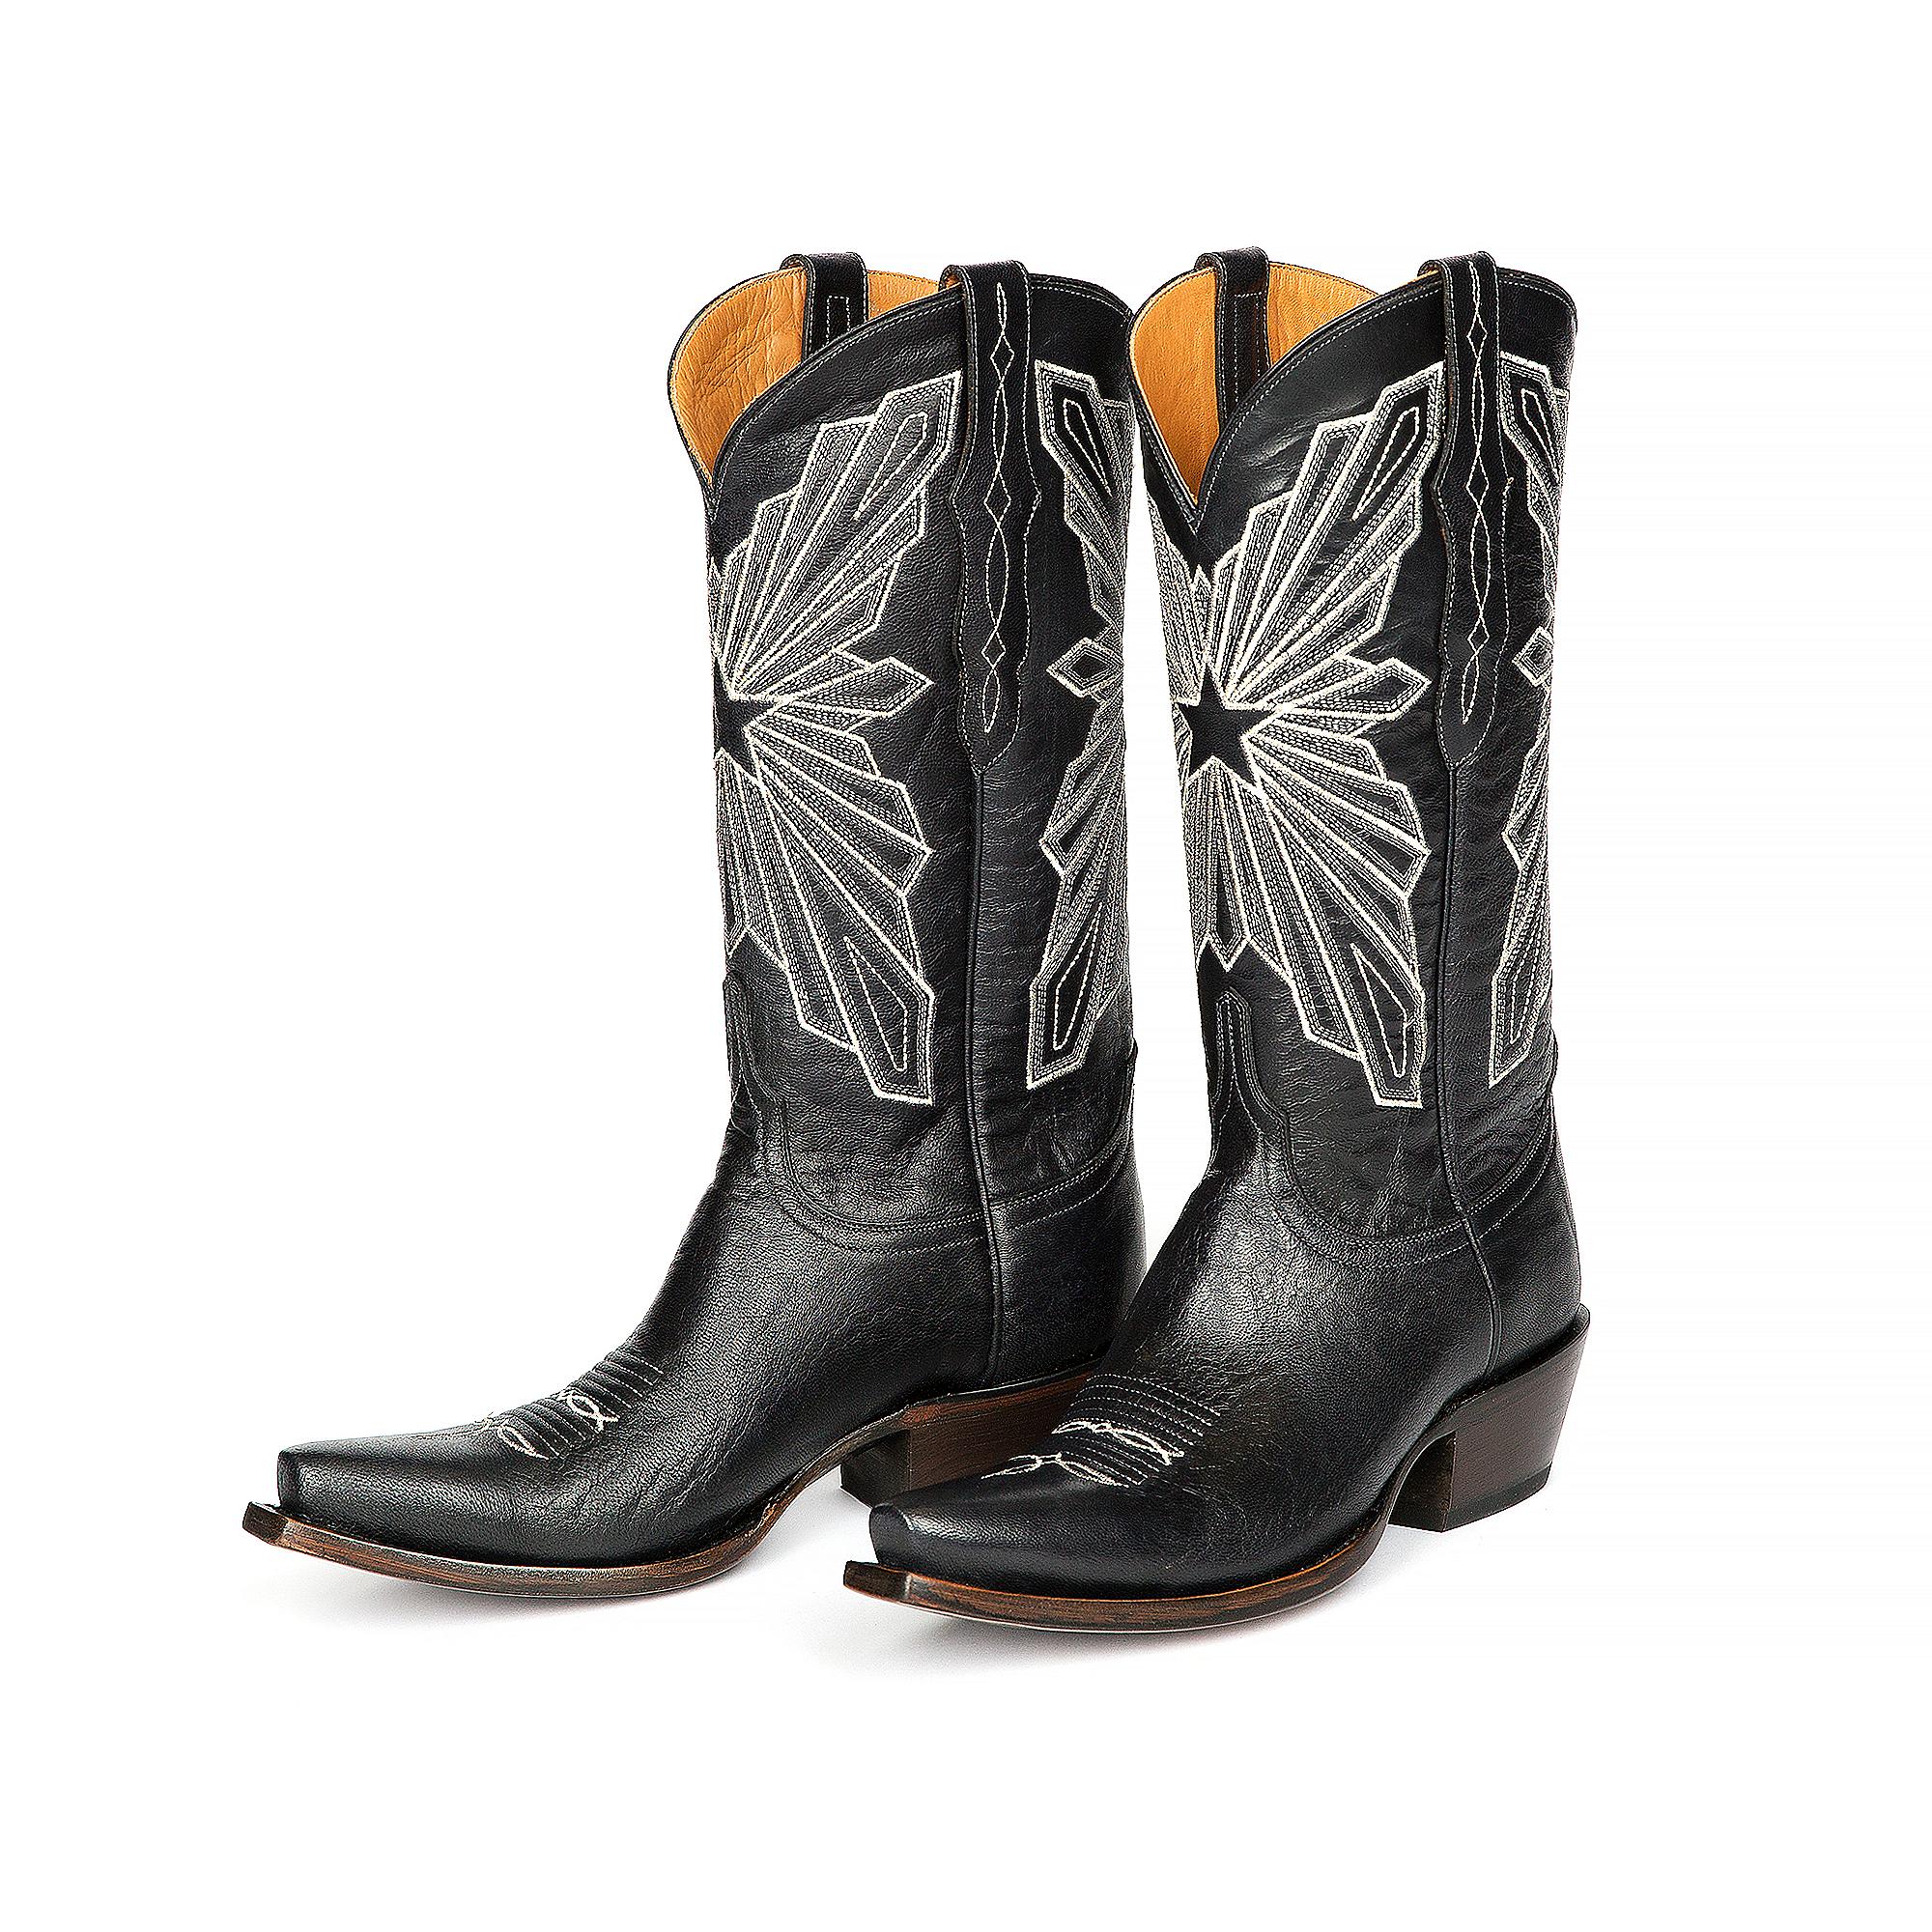 online store cb4cd 8ae4f Dallas Cowboys Lucchese Womens Cowhide Boot | Dallas Cowboys ...